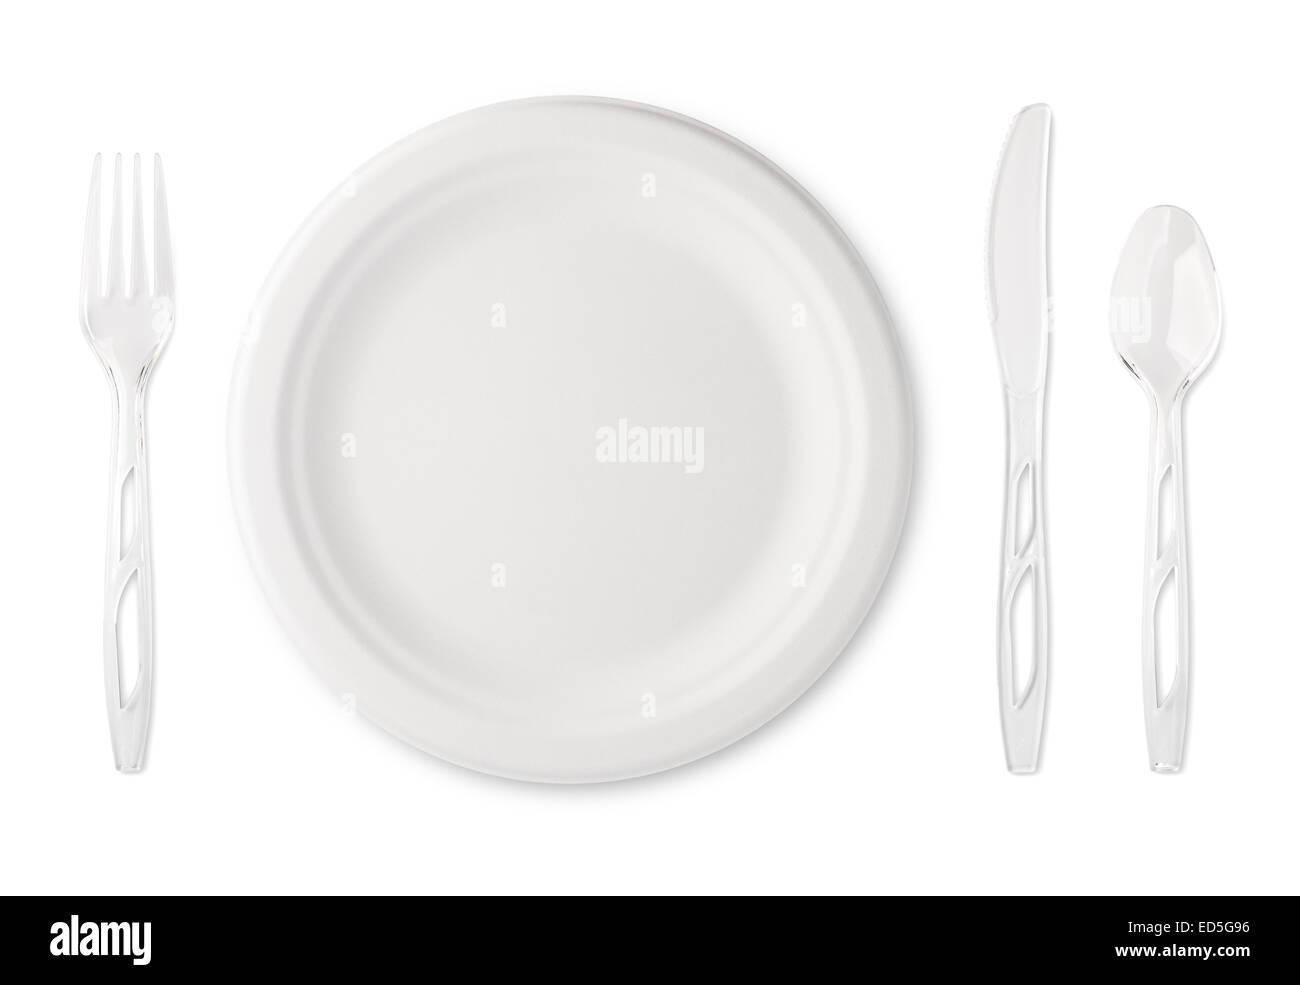 Papier, Platte und klaren Kunststoff-Geschirr Stockbild